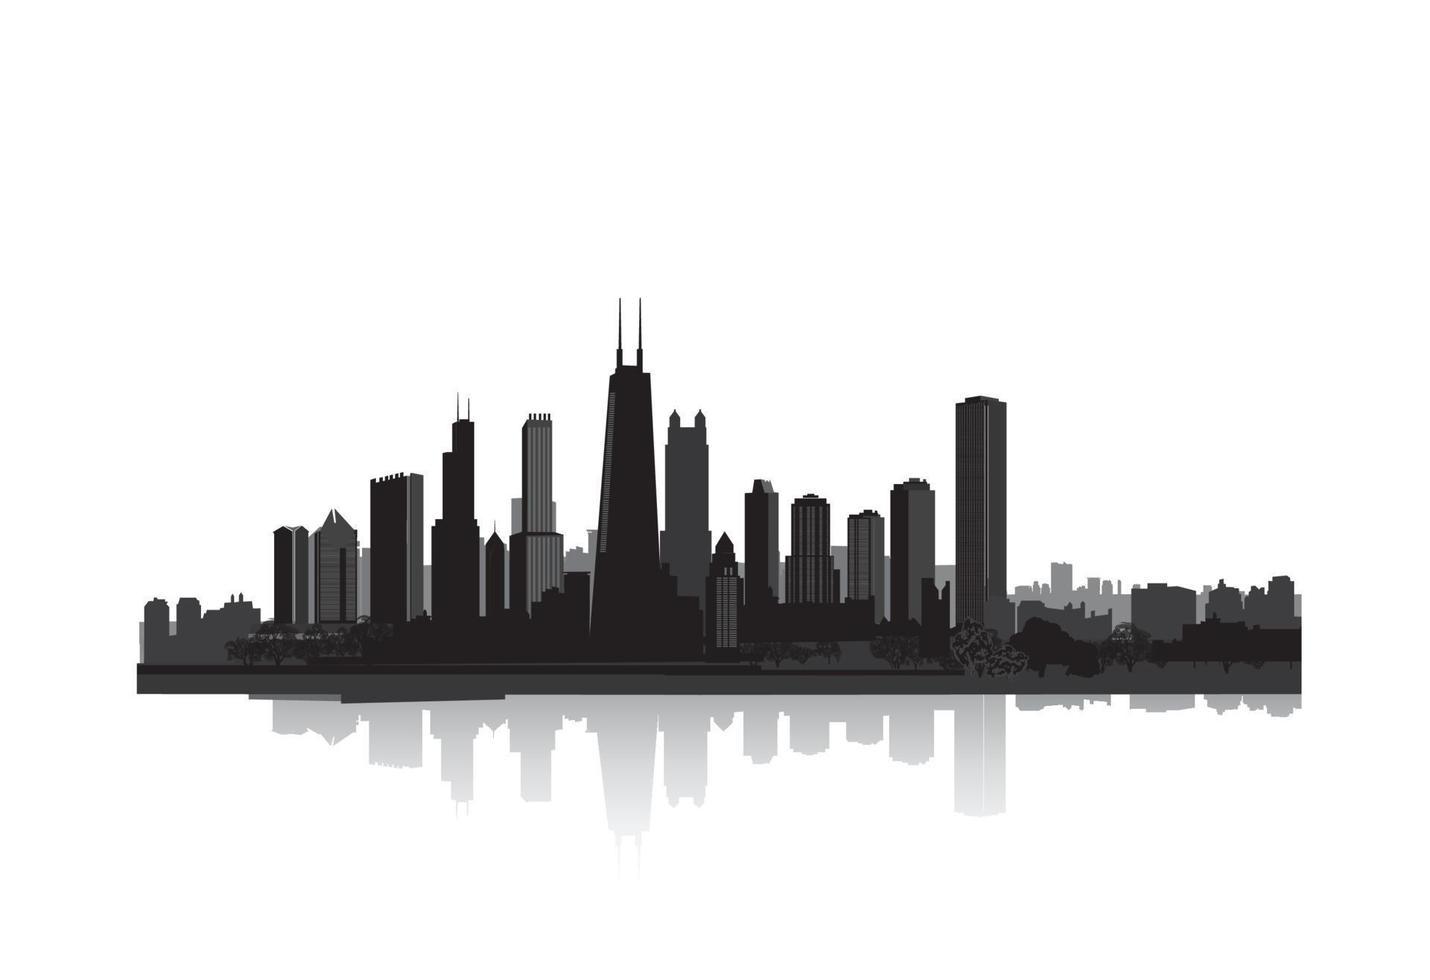 chicago city skyline. amerikansk stadsbild panorama. vektor